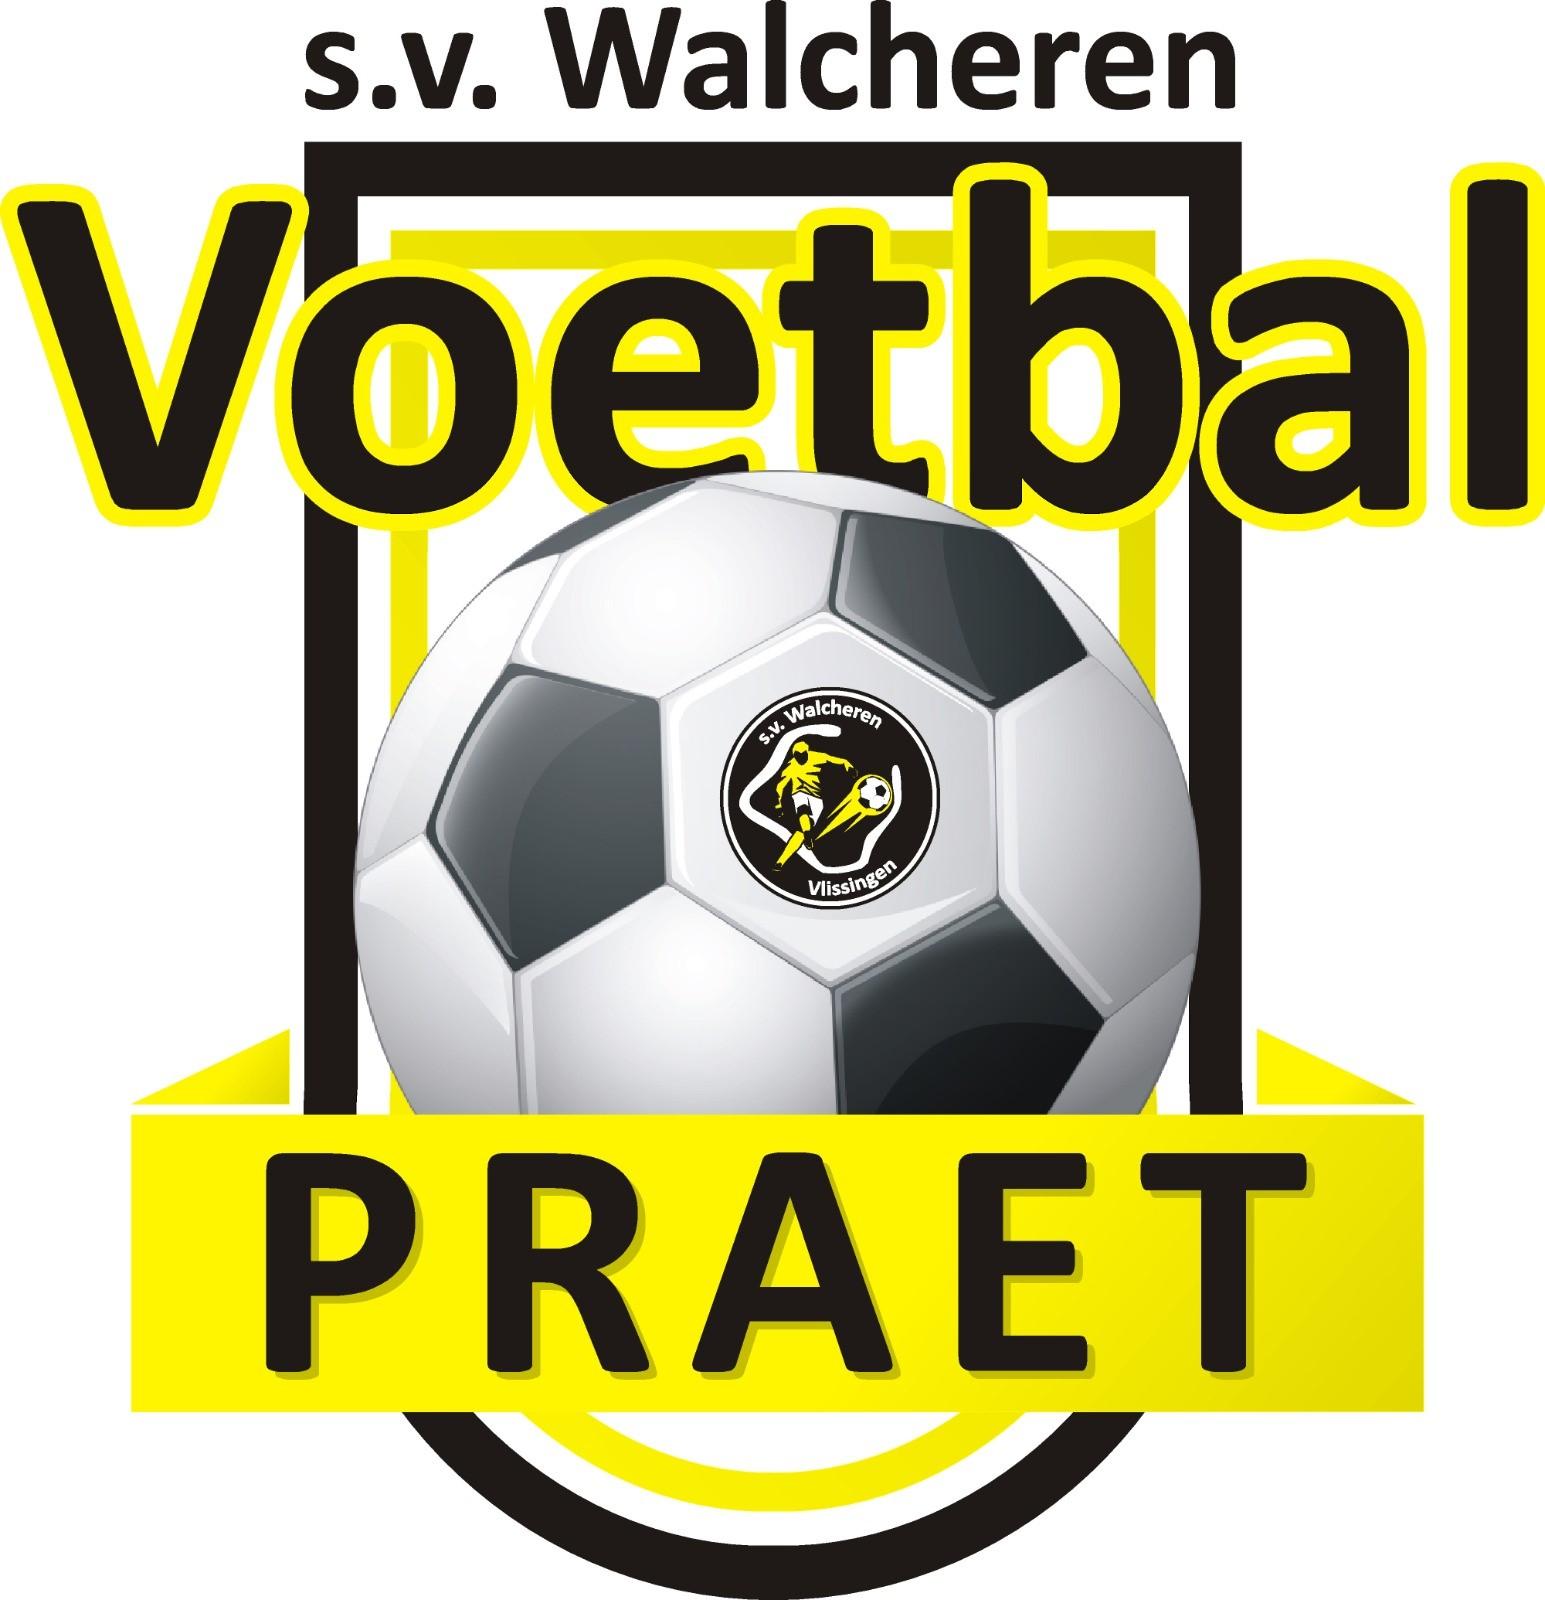 """Voetbalpraet"" vrijdag 22 oktober"